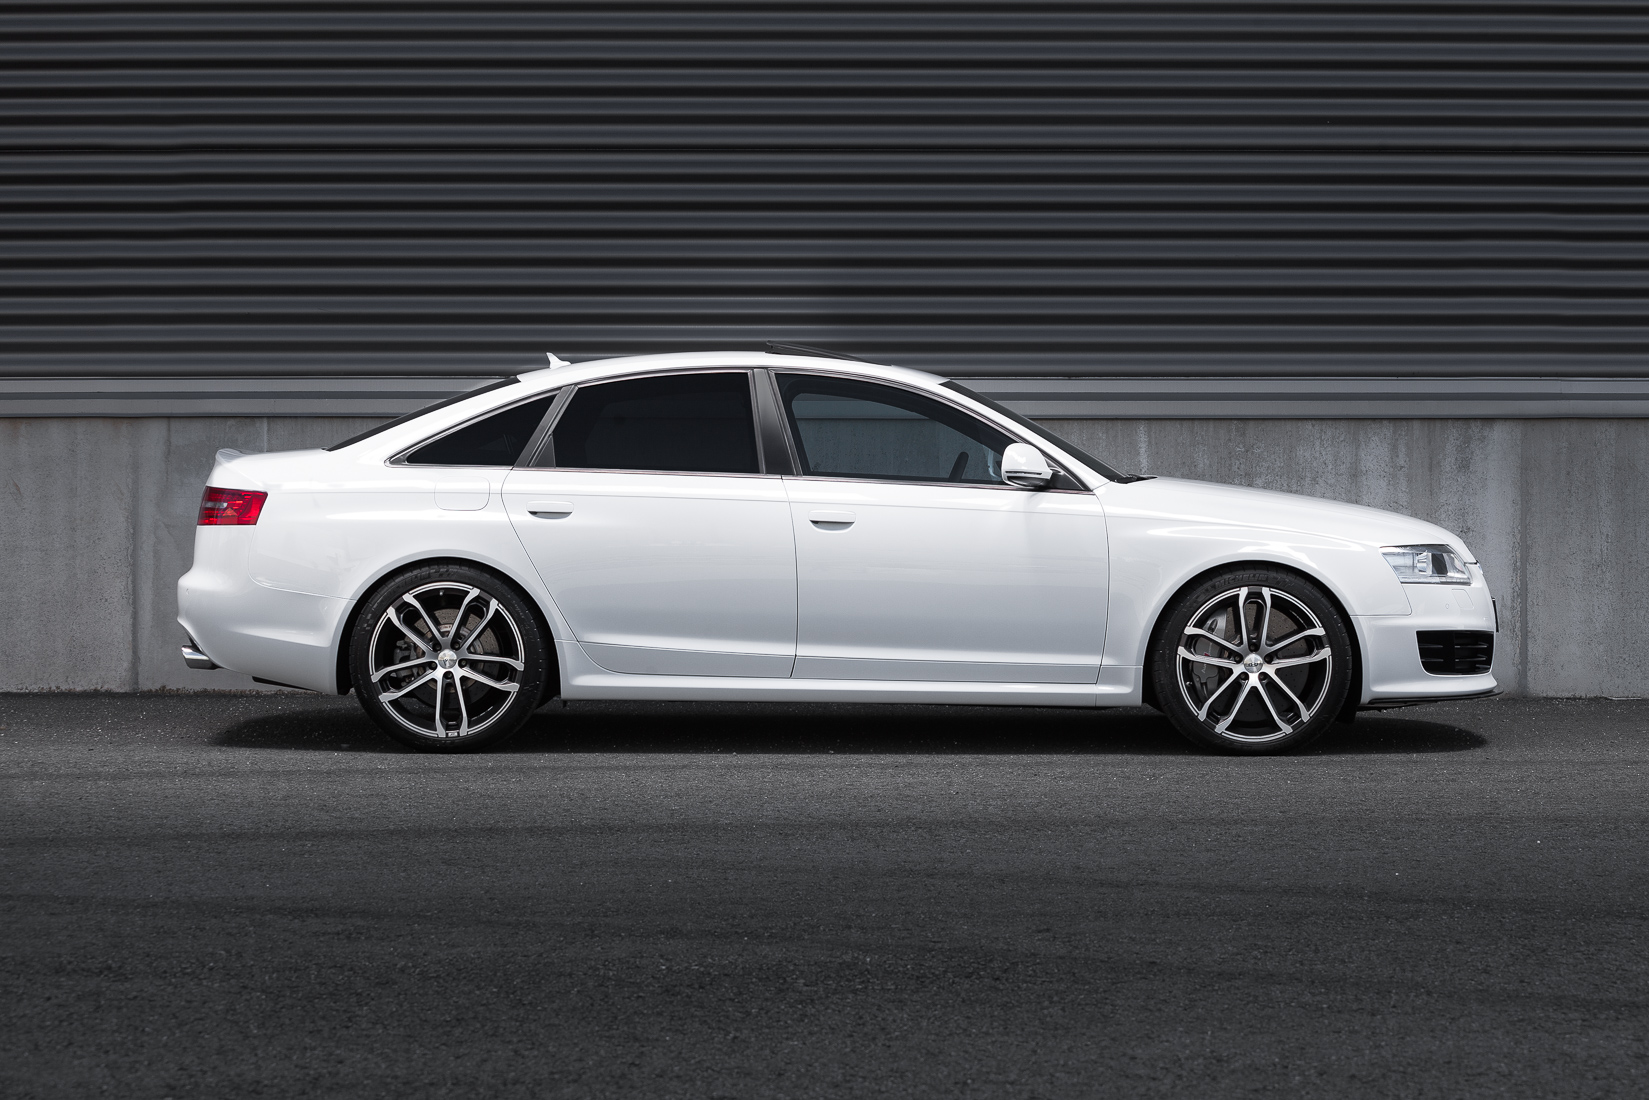 Audi Rs6 Abt Mnyfoto